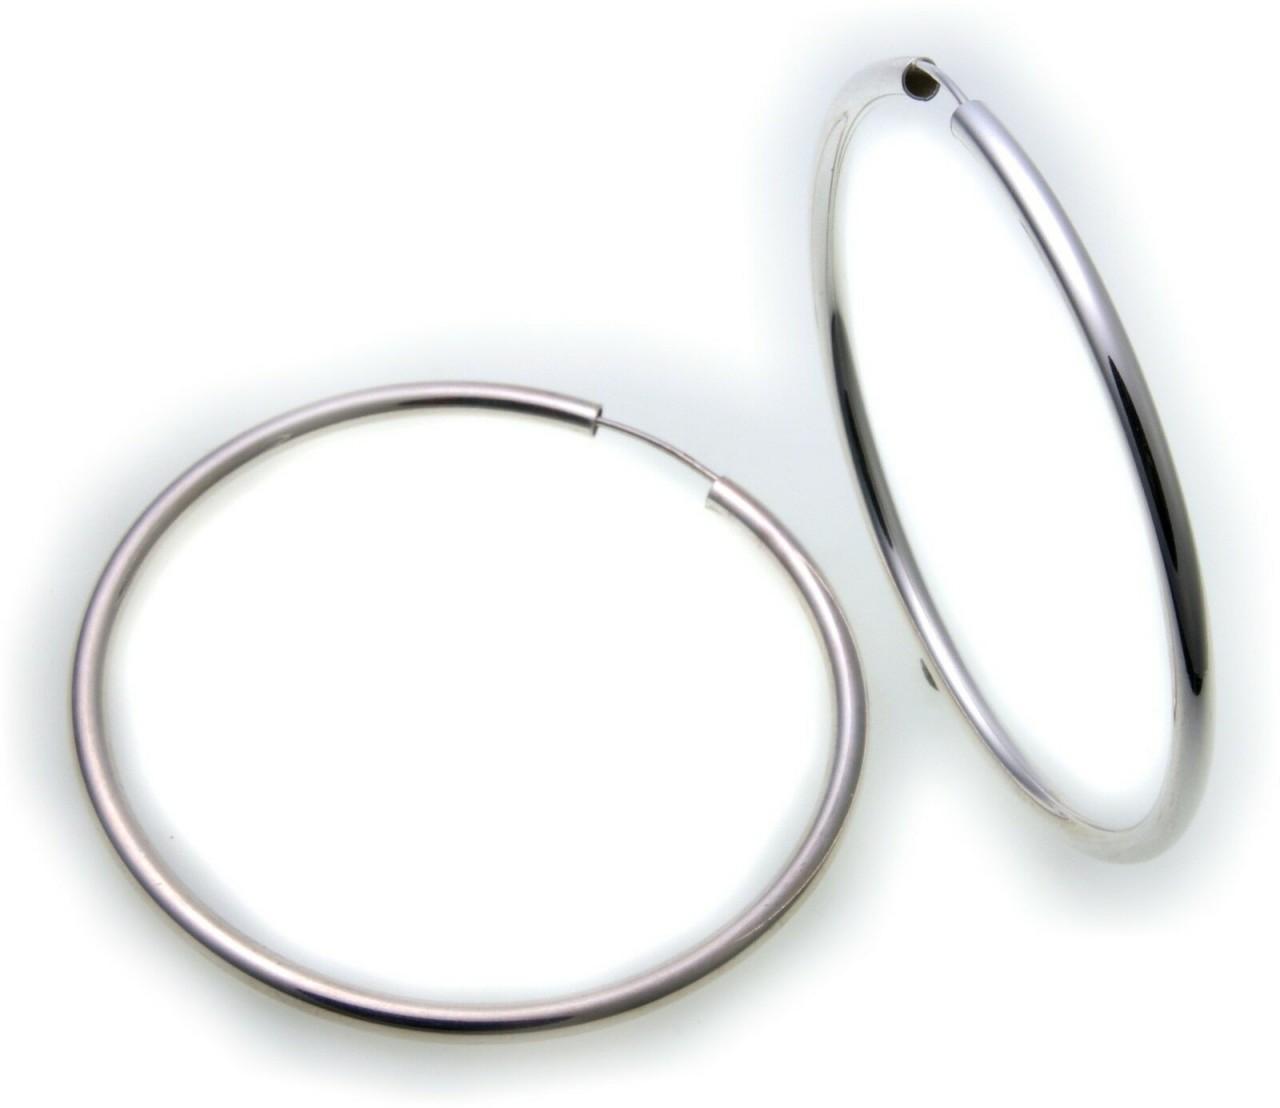 Damen Ohrringe XL Creolen Silber 925 Sterlingsilber 60 mm Rohrform Rohrcreolen